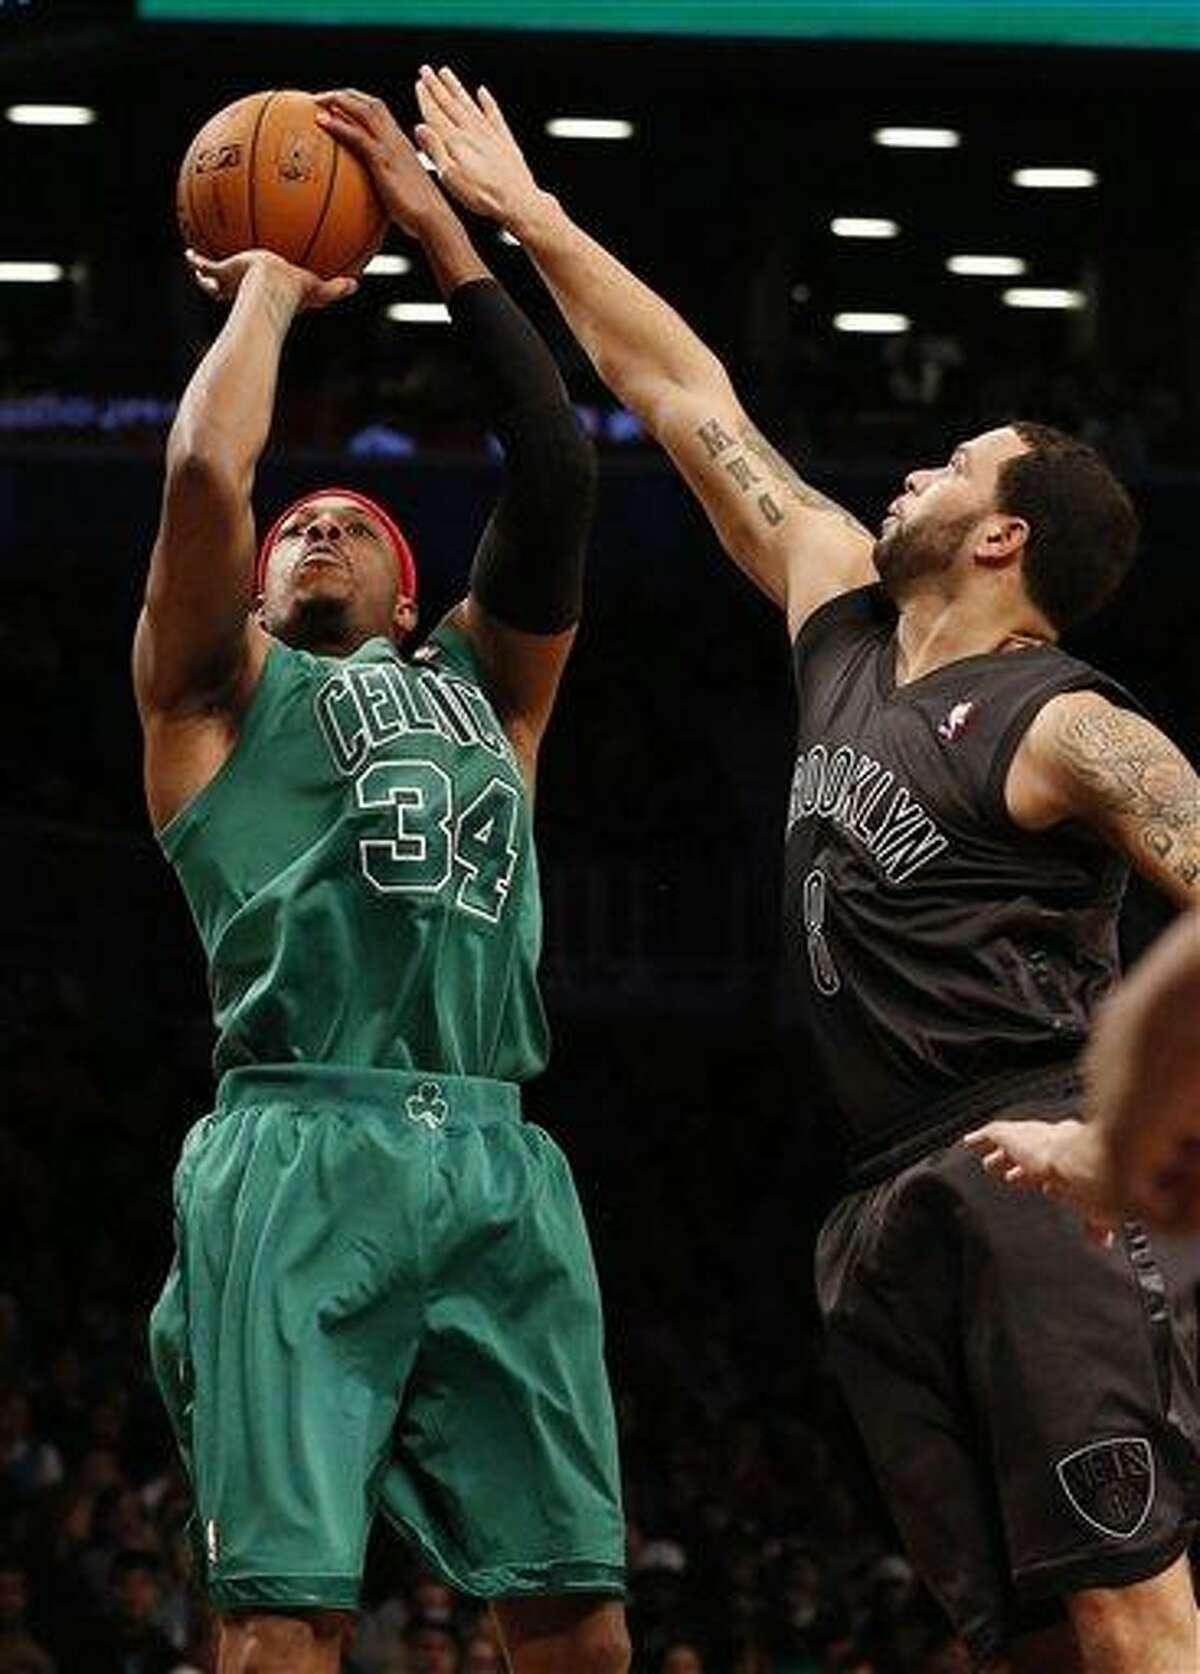 Boston Celtics forward Paul Pierce (34) shoots against Brooklyn Nets guard Deron Williams (8) in the second half of their NBA basketball game at Barclays Center, Tuesday, Dec. 25, 2012, in New York. Boston won 93-76. (AP Photo/John Minchillo)